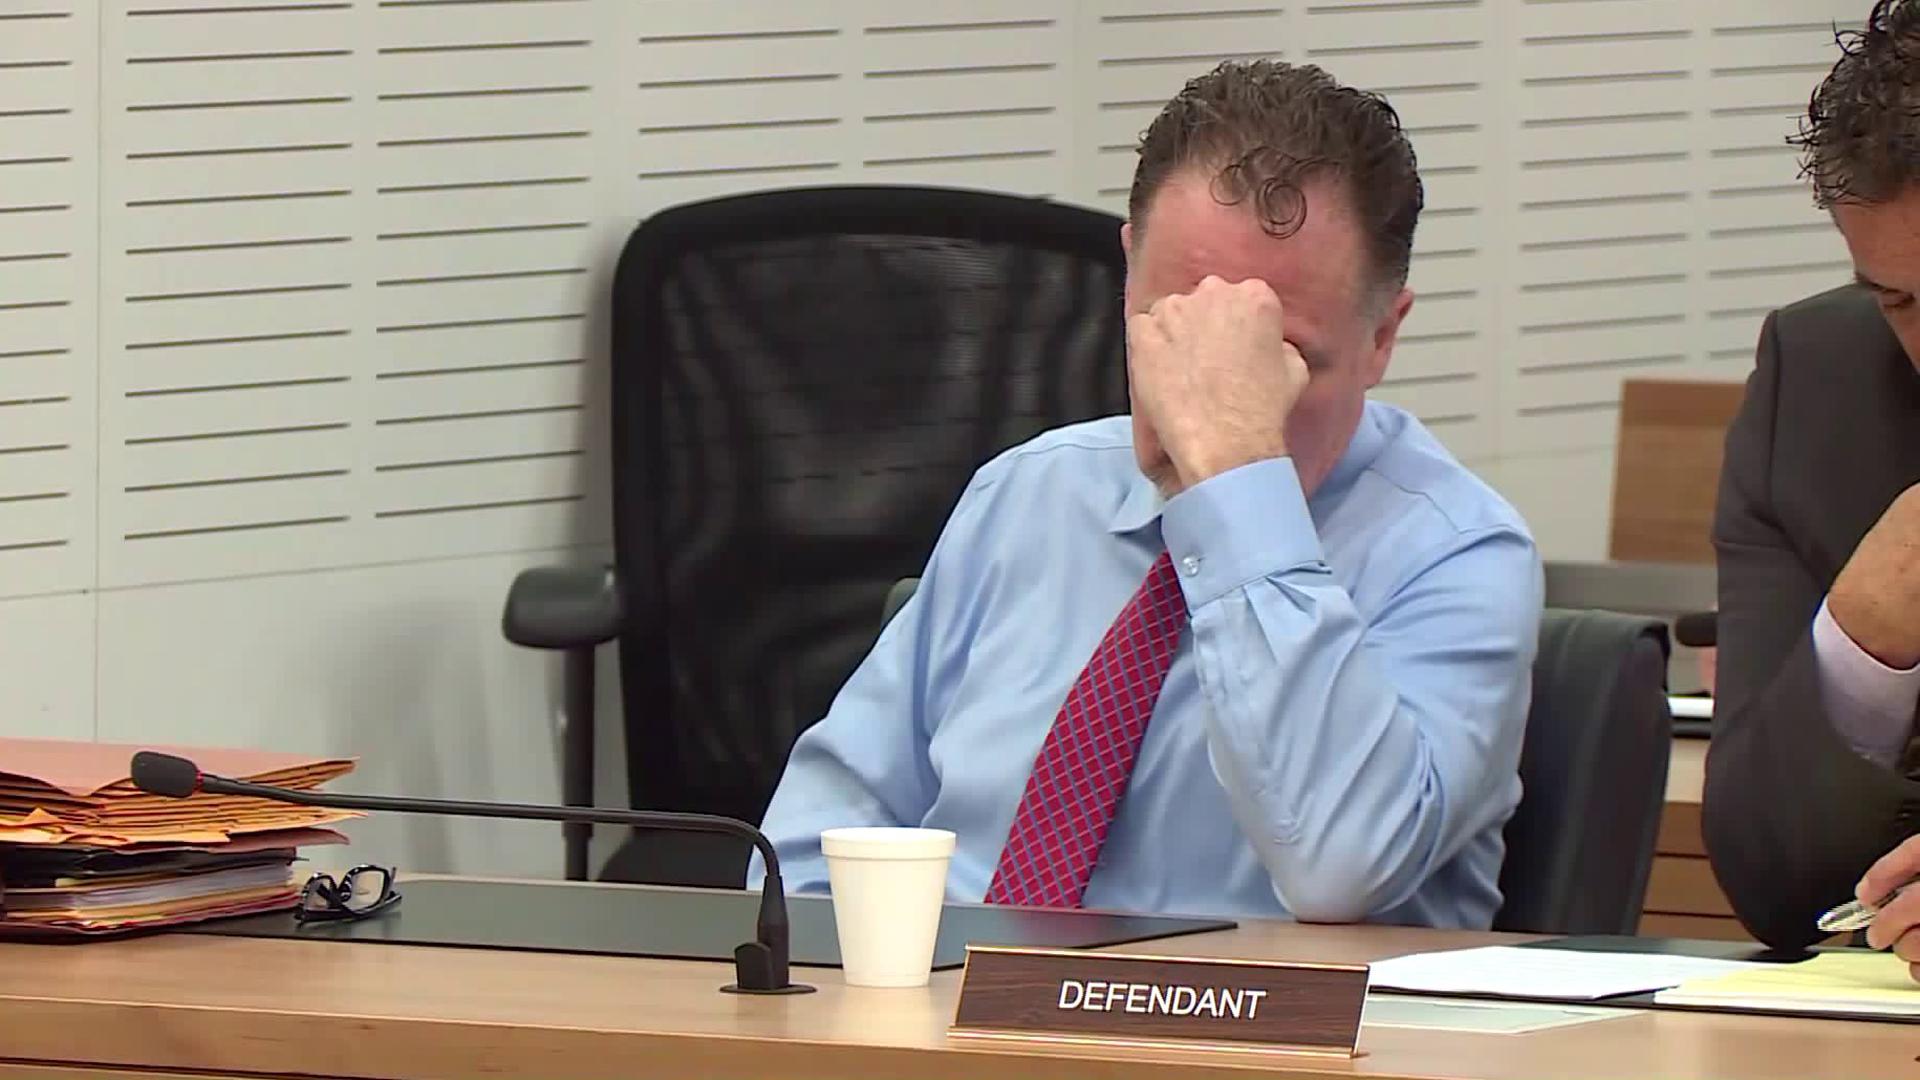 Charles Merritt reacts after a San Bernardino recommends he be sentenced to death on June 24, 2019. (Credit: KTLA)